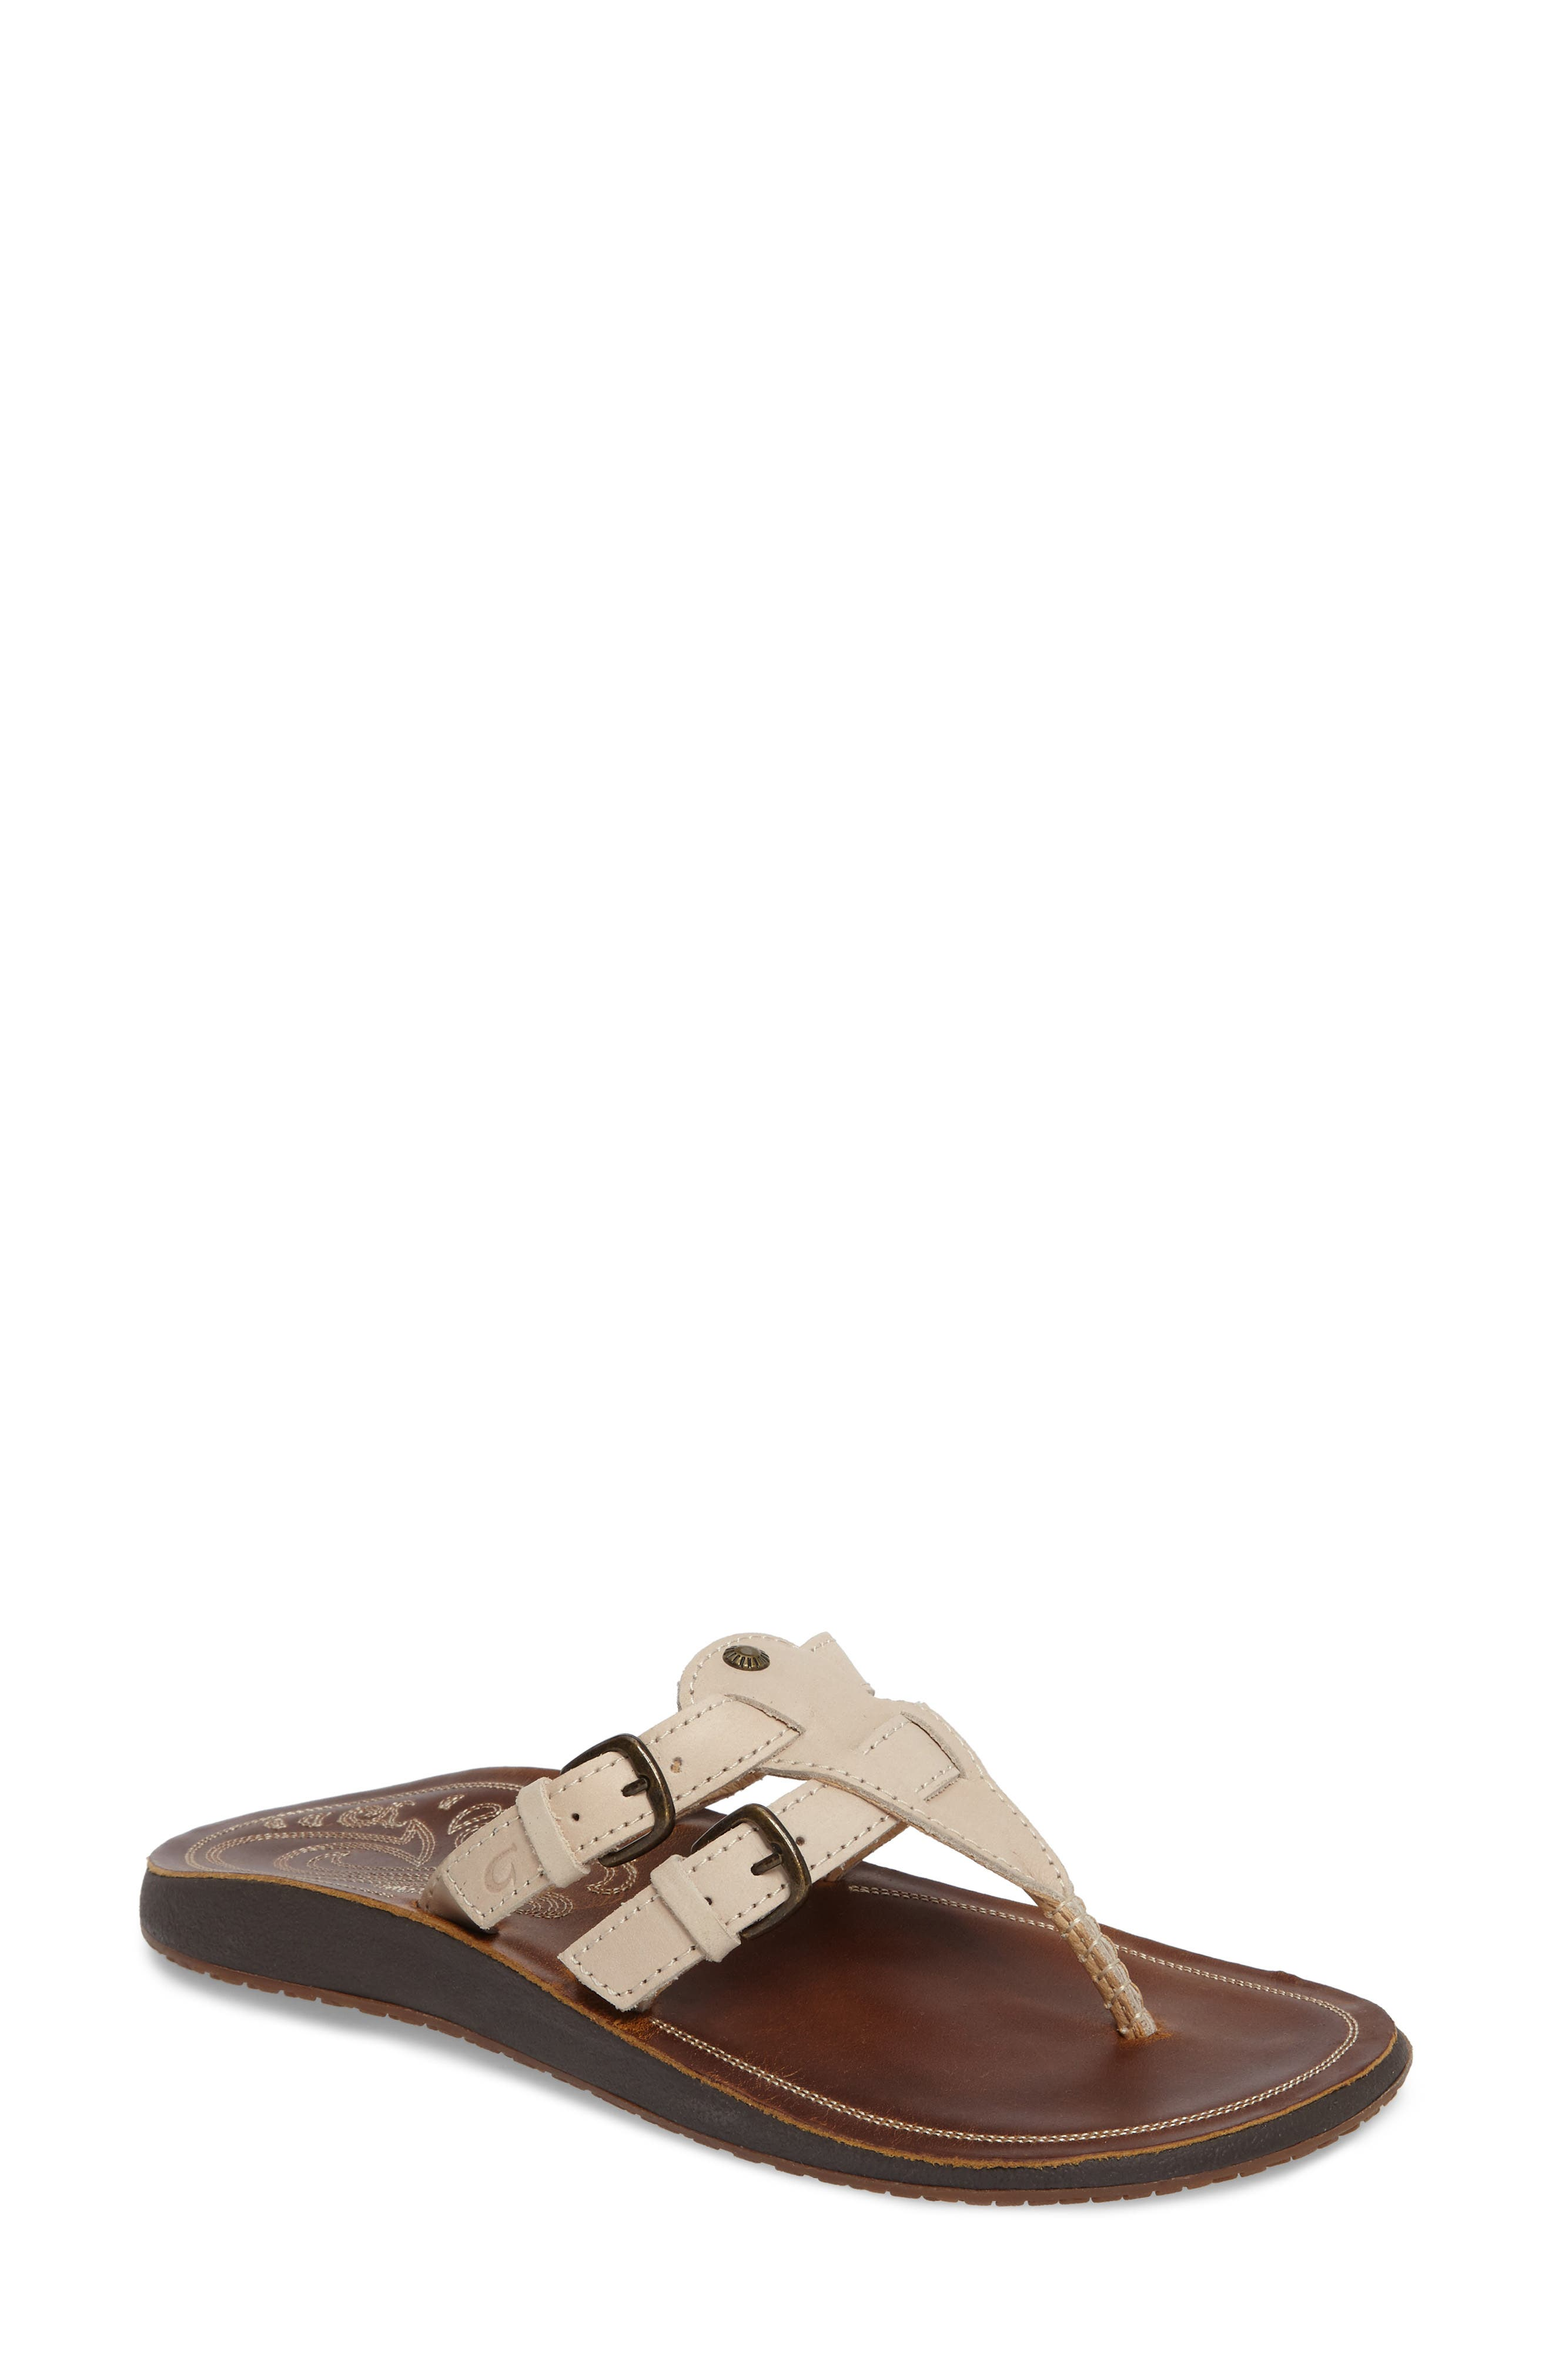 Honoka'a Buckle Flip Flop,                         Main,                         color, Tapa/ Sahara Leather